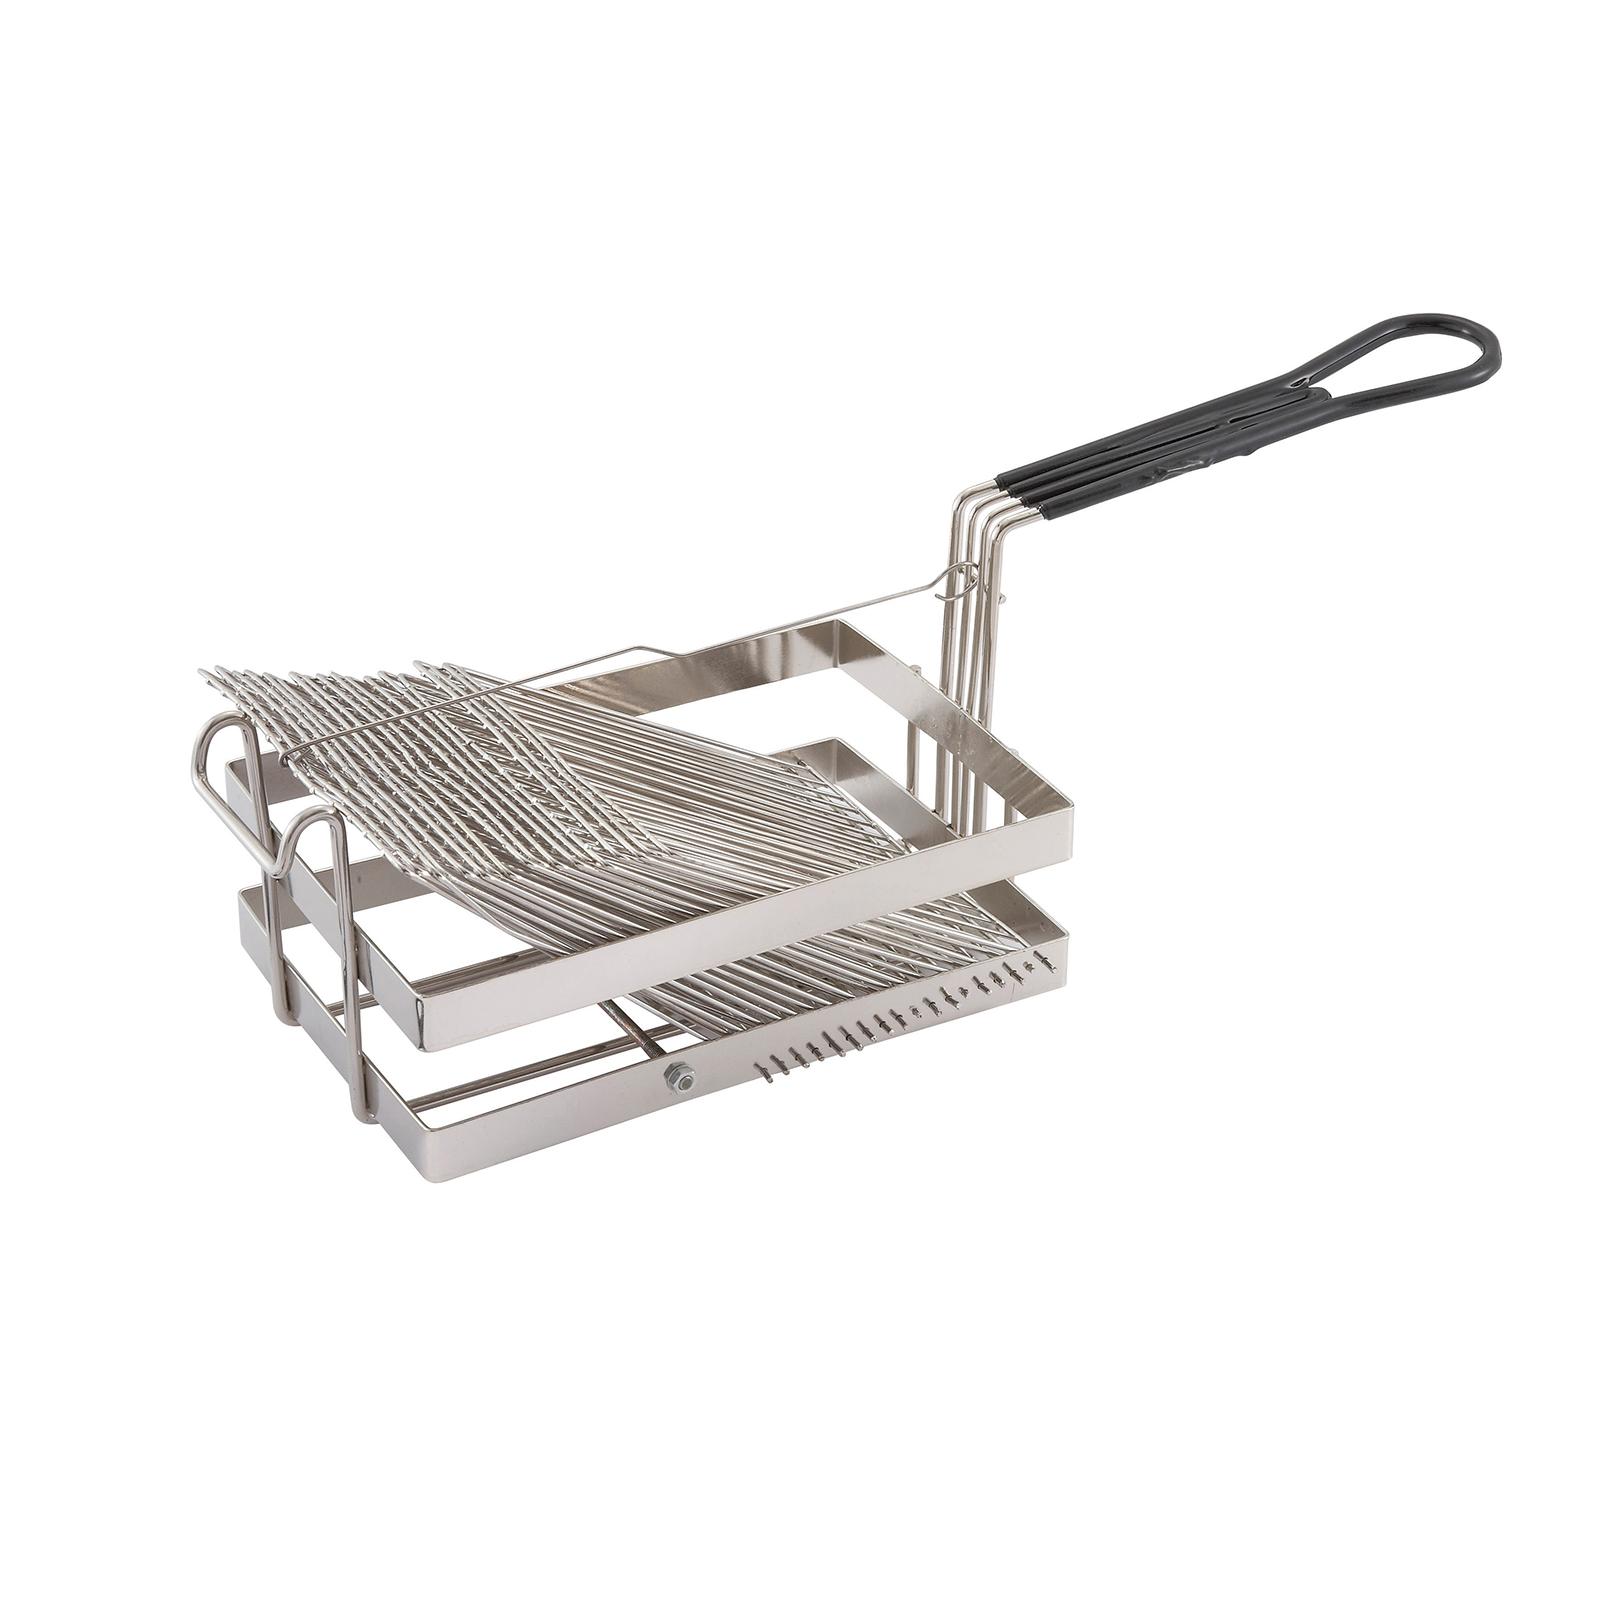 1600-32 Winco TB-18 fryer basket